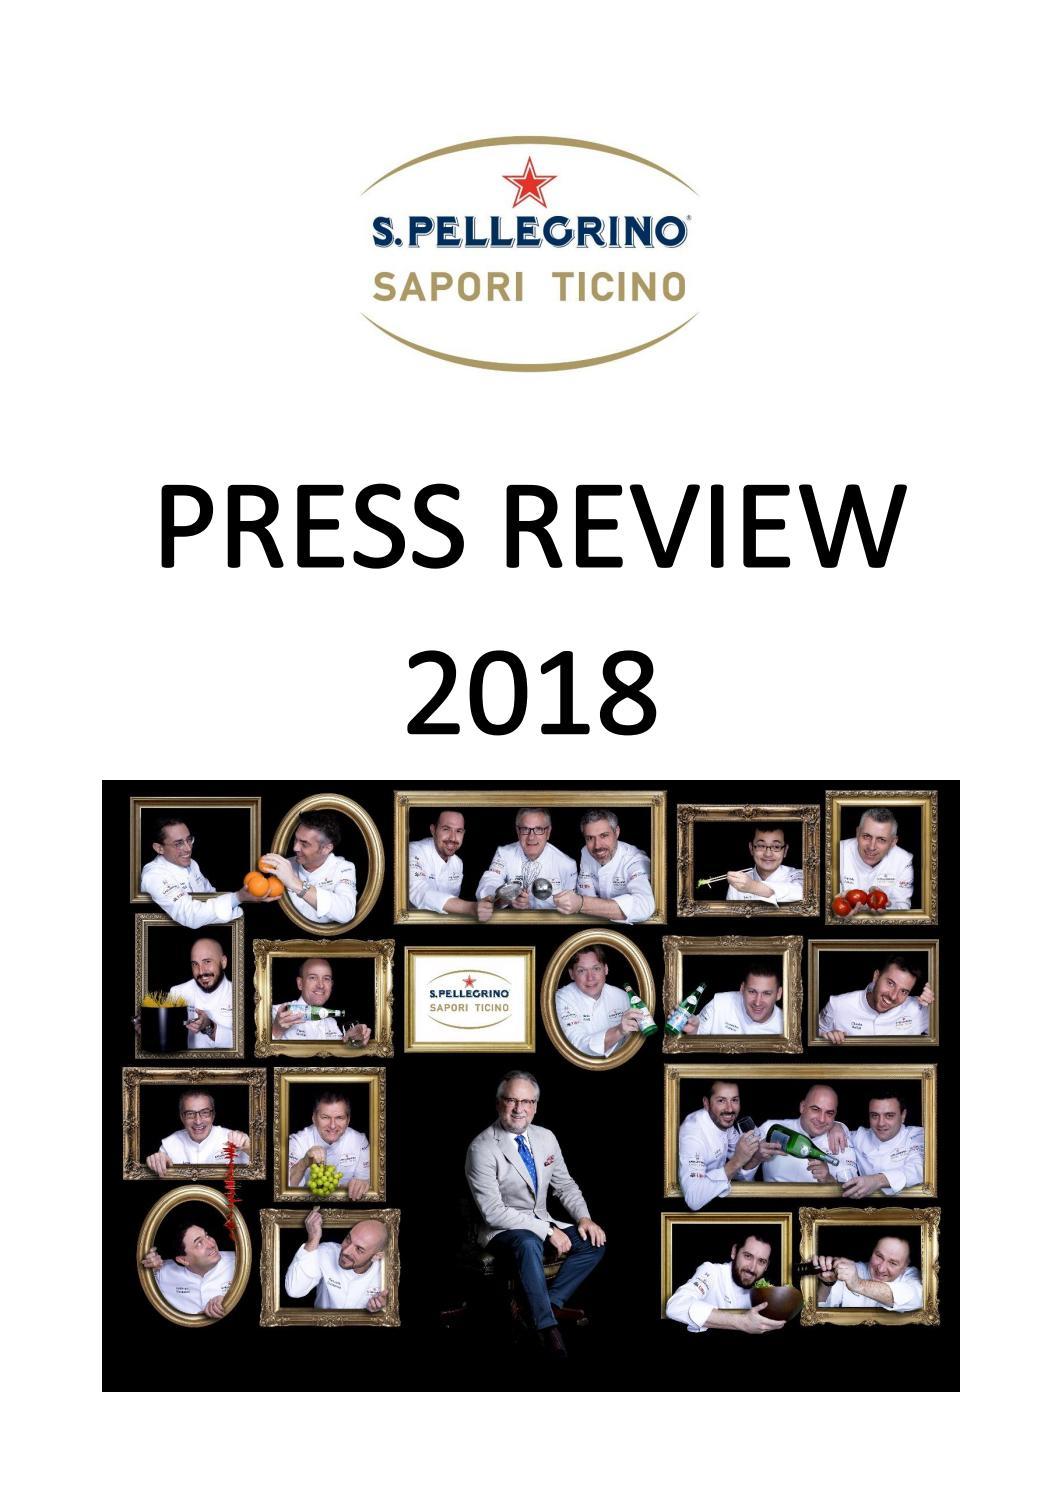 Rassegna Stampa S Pellegrino Sapori Ticino 2018 By Info Saporiticino Issuu